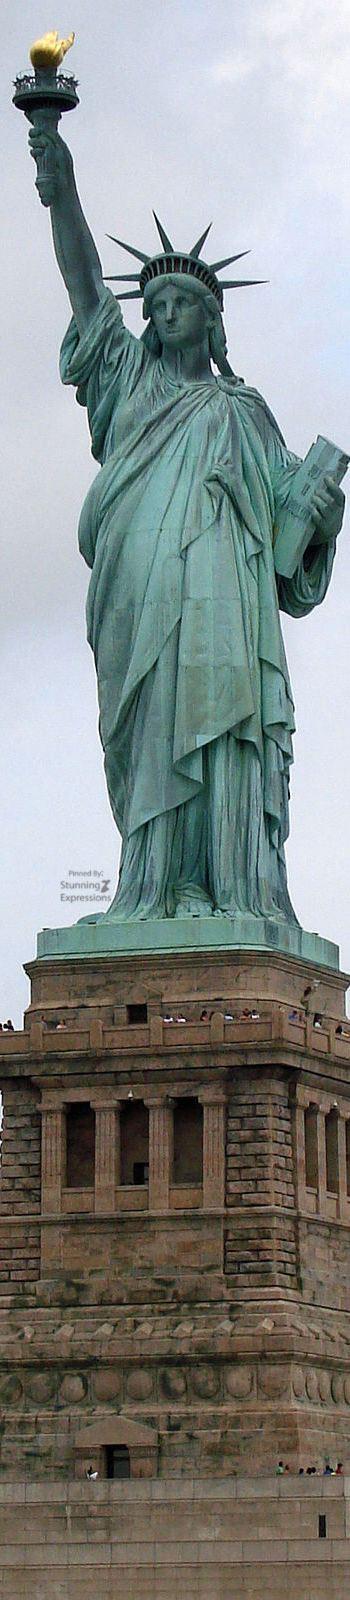 Statue of Liberty -  New York City